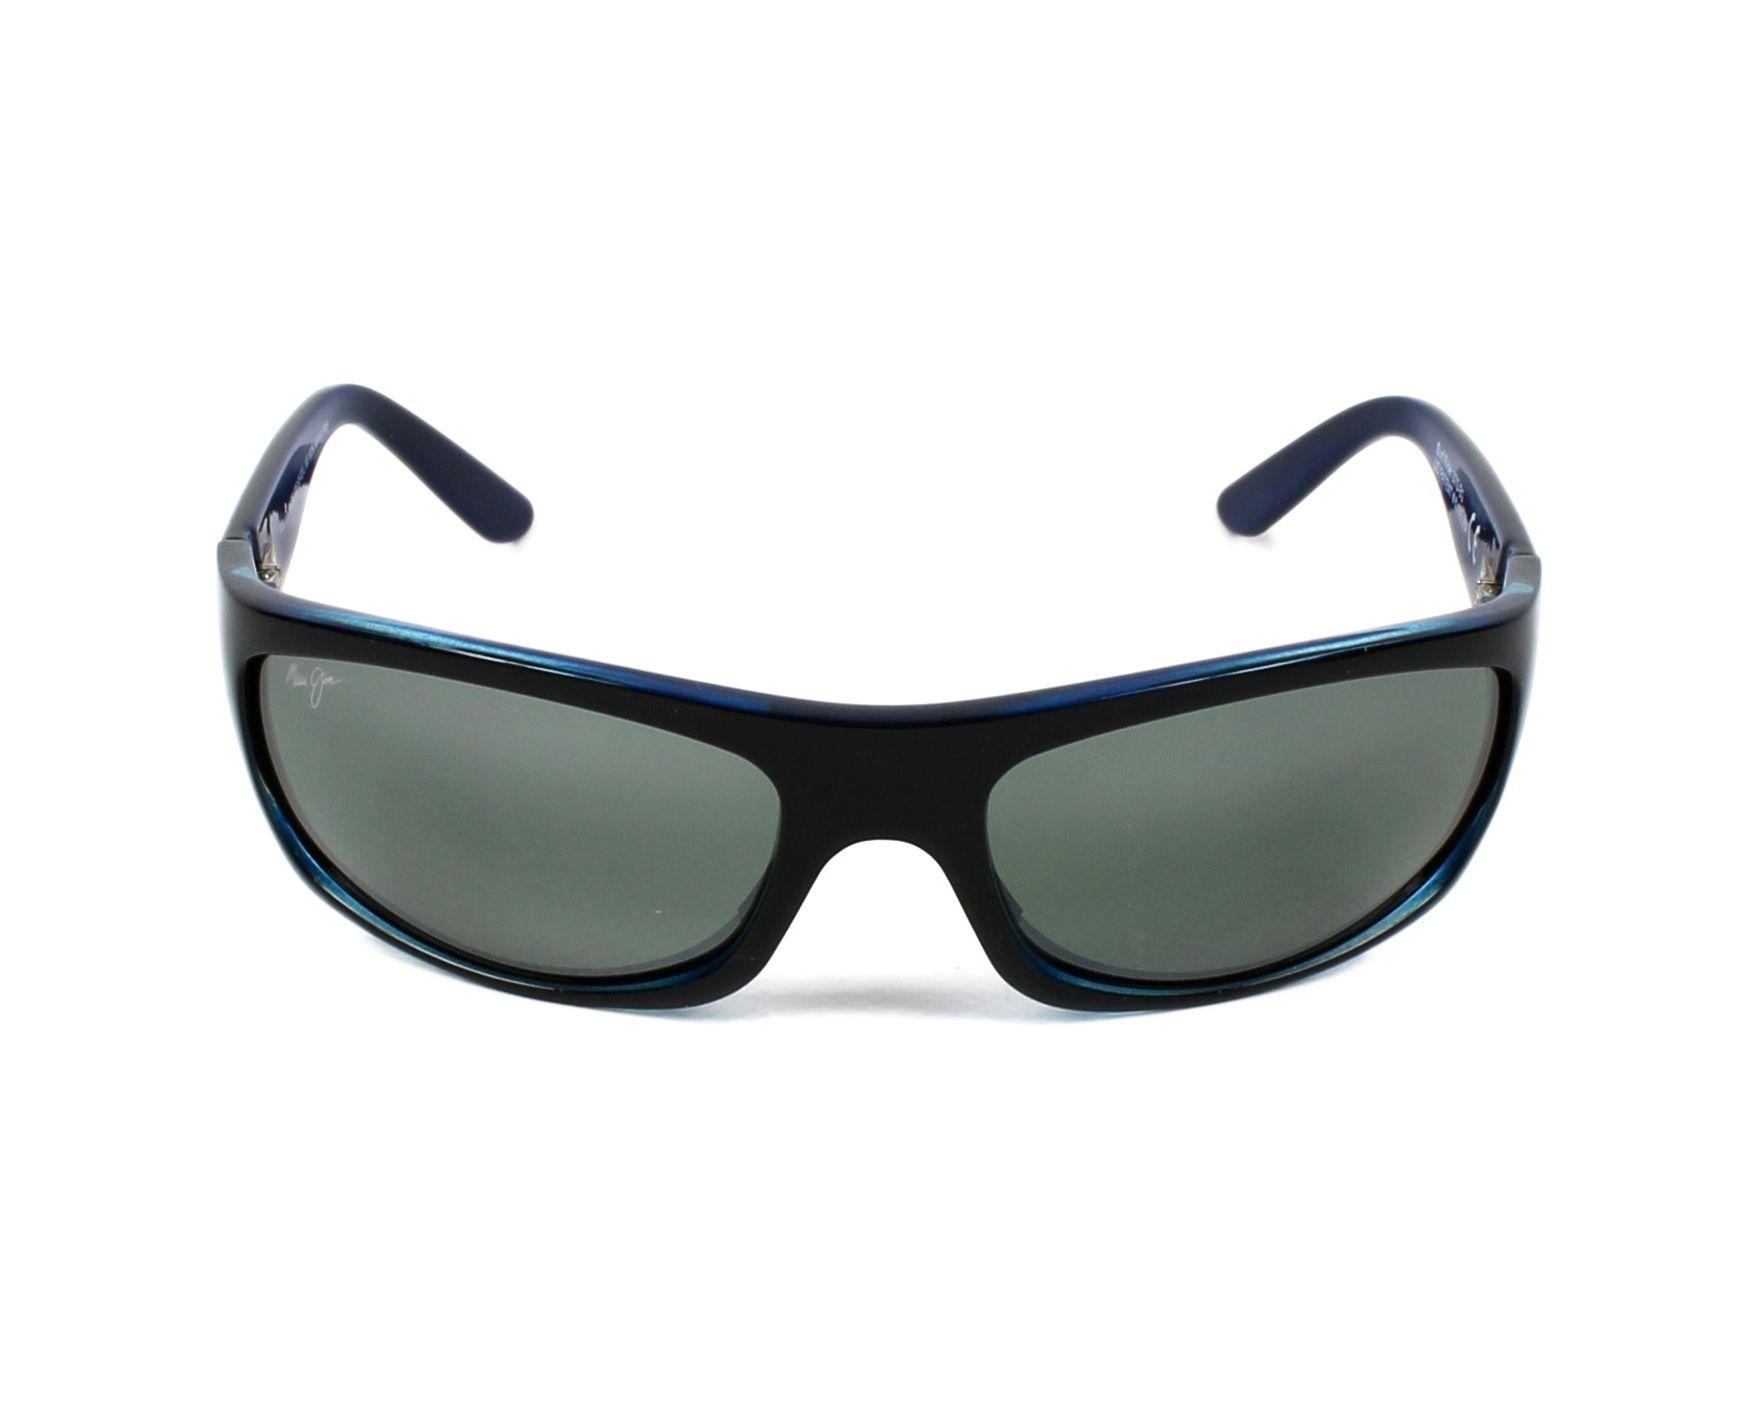 c7779595e9c6 Sunglasses Maui Jim 261 02G - Black front view